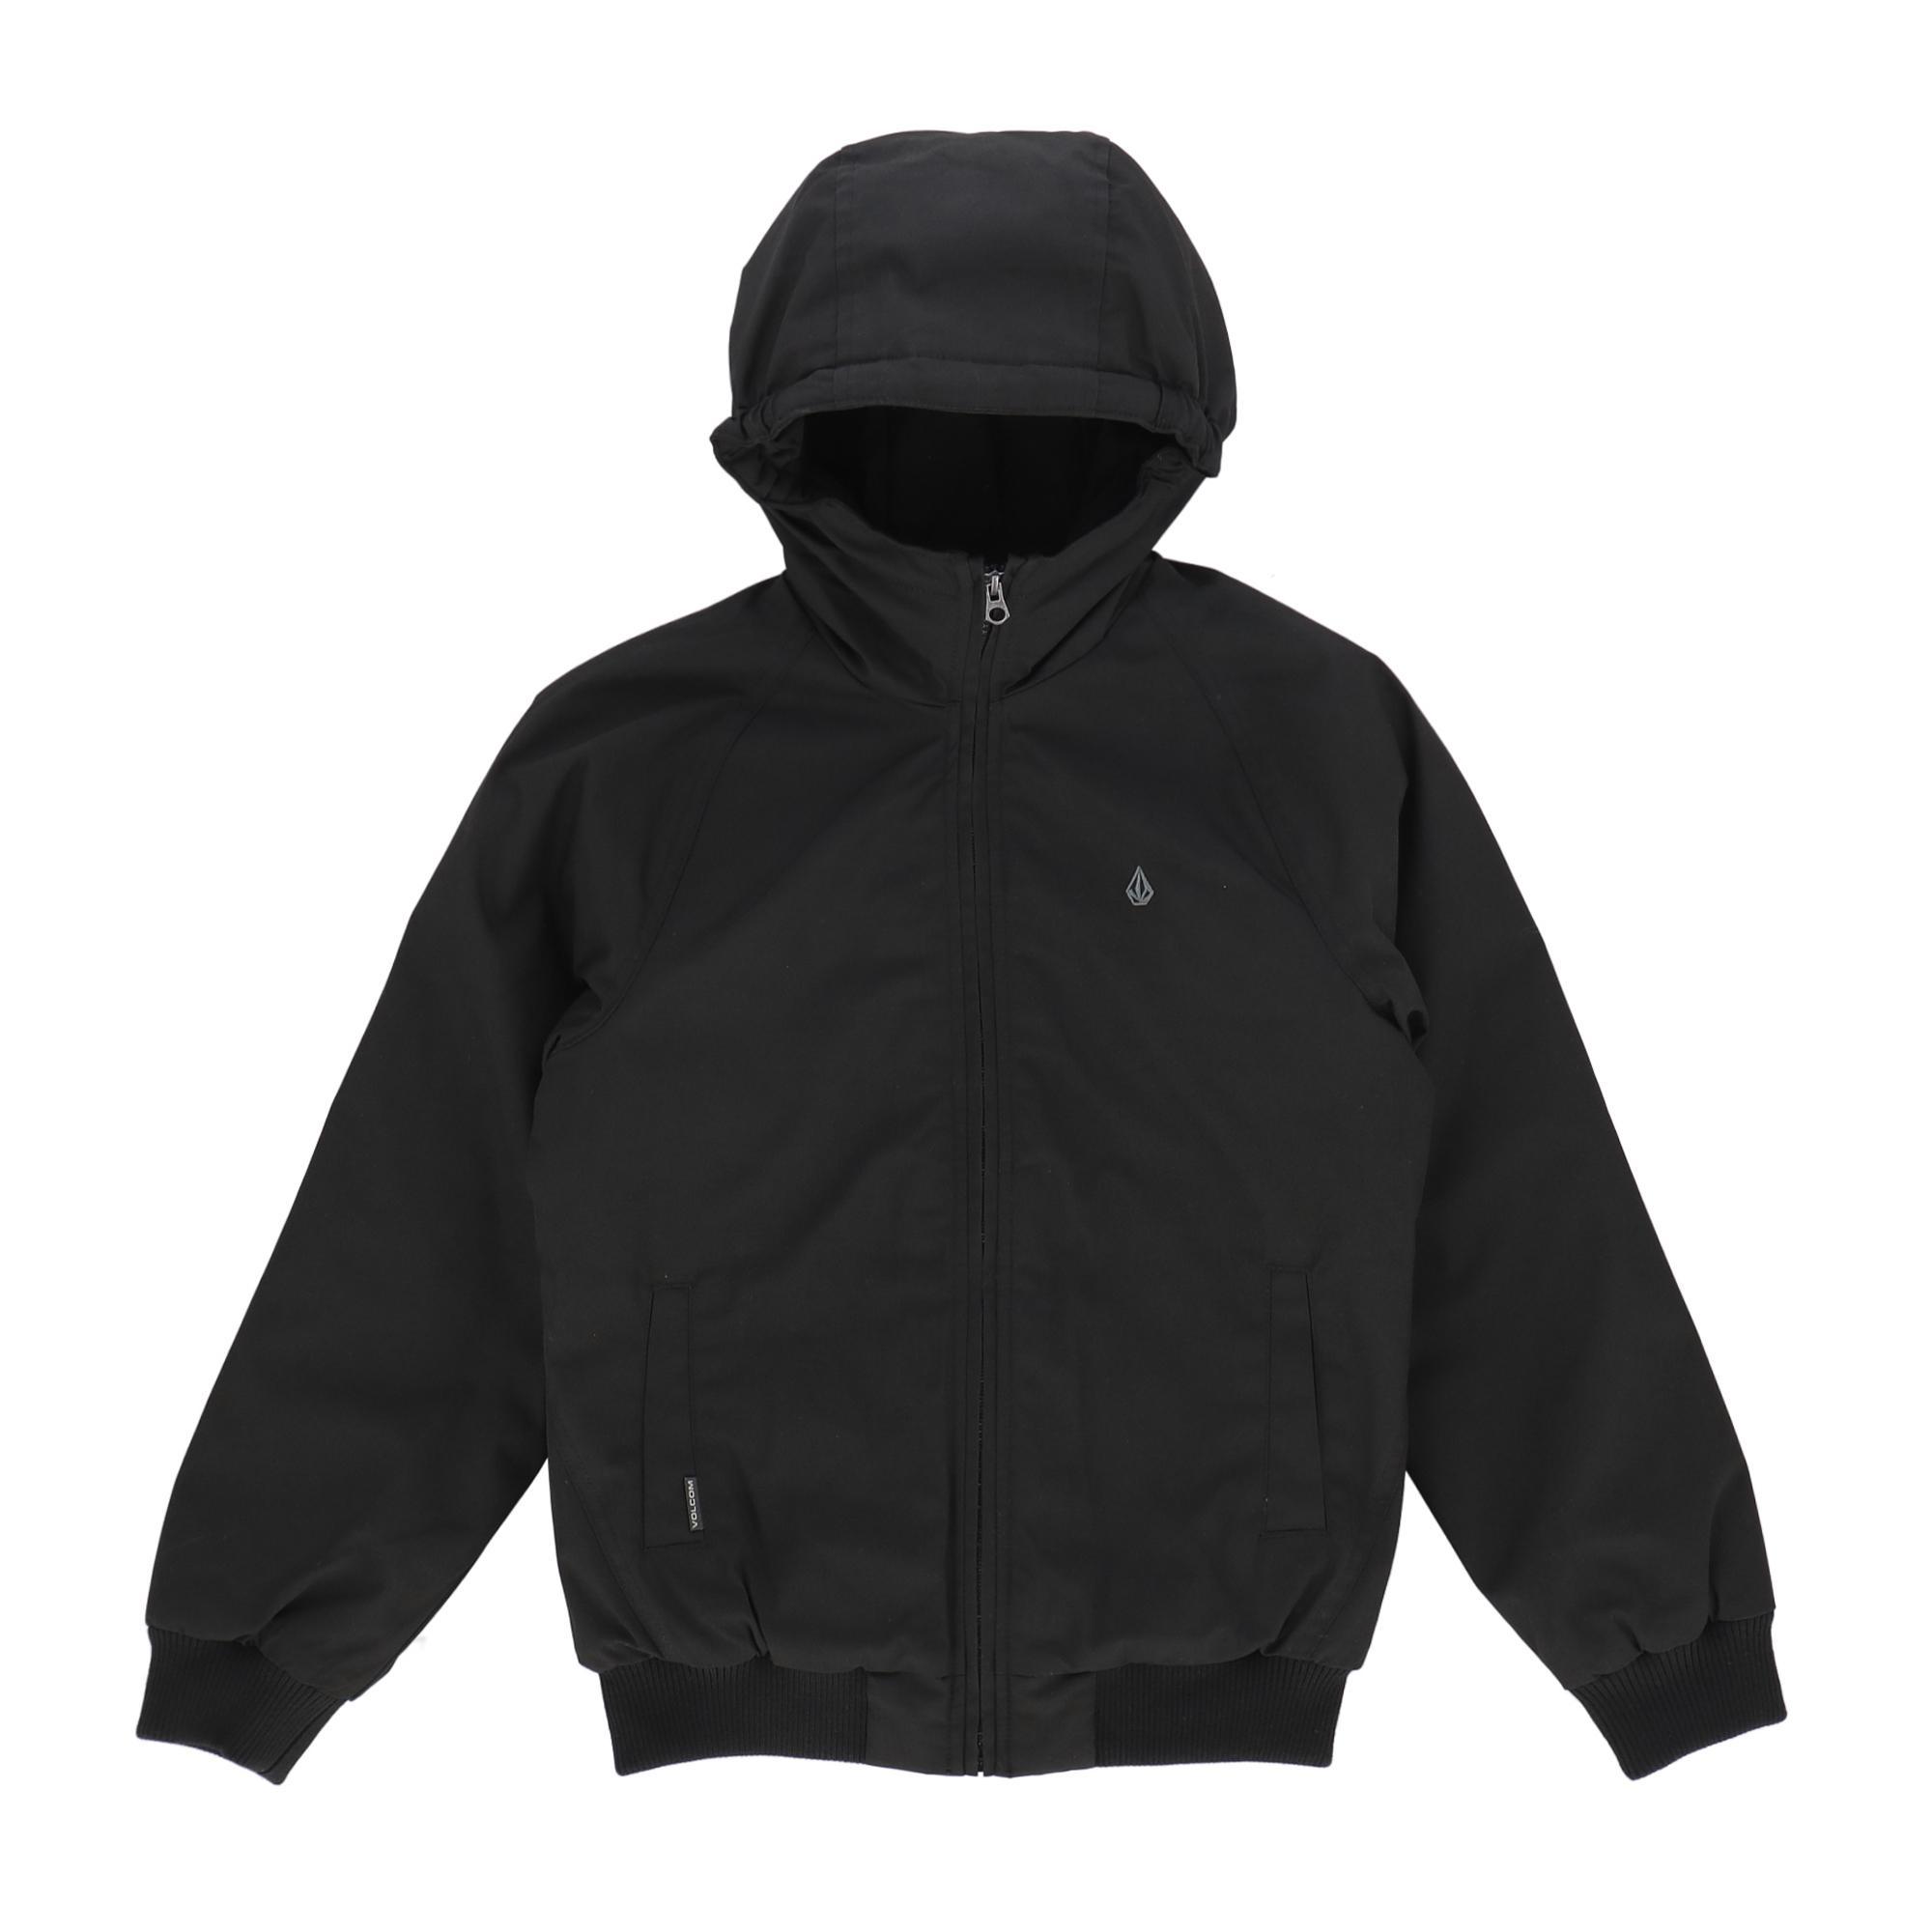 Volcom Hernan 5k Jacket Black